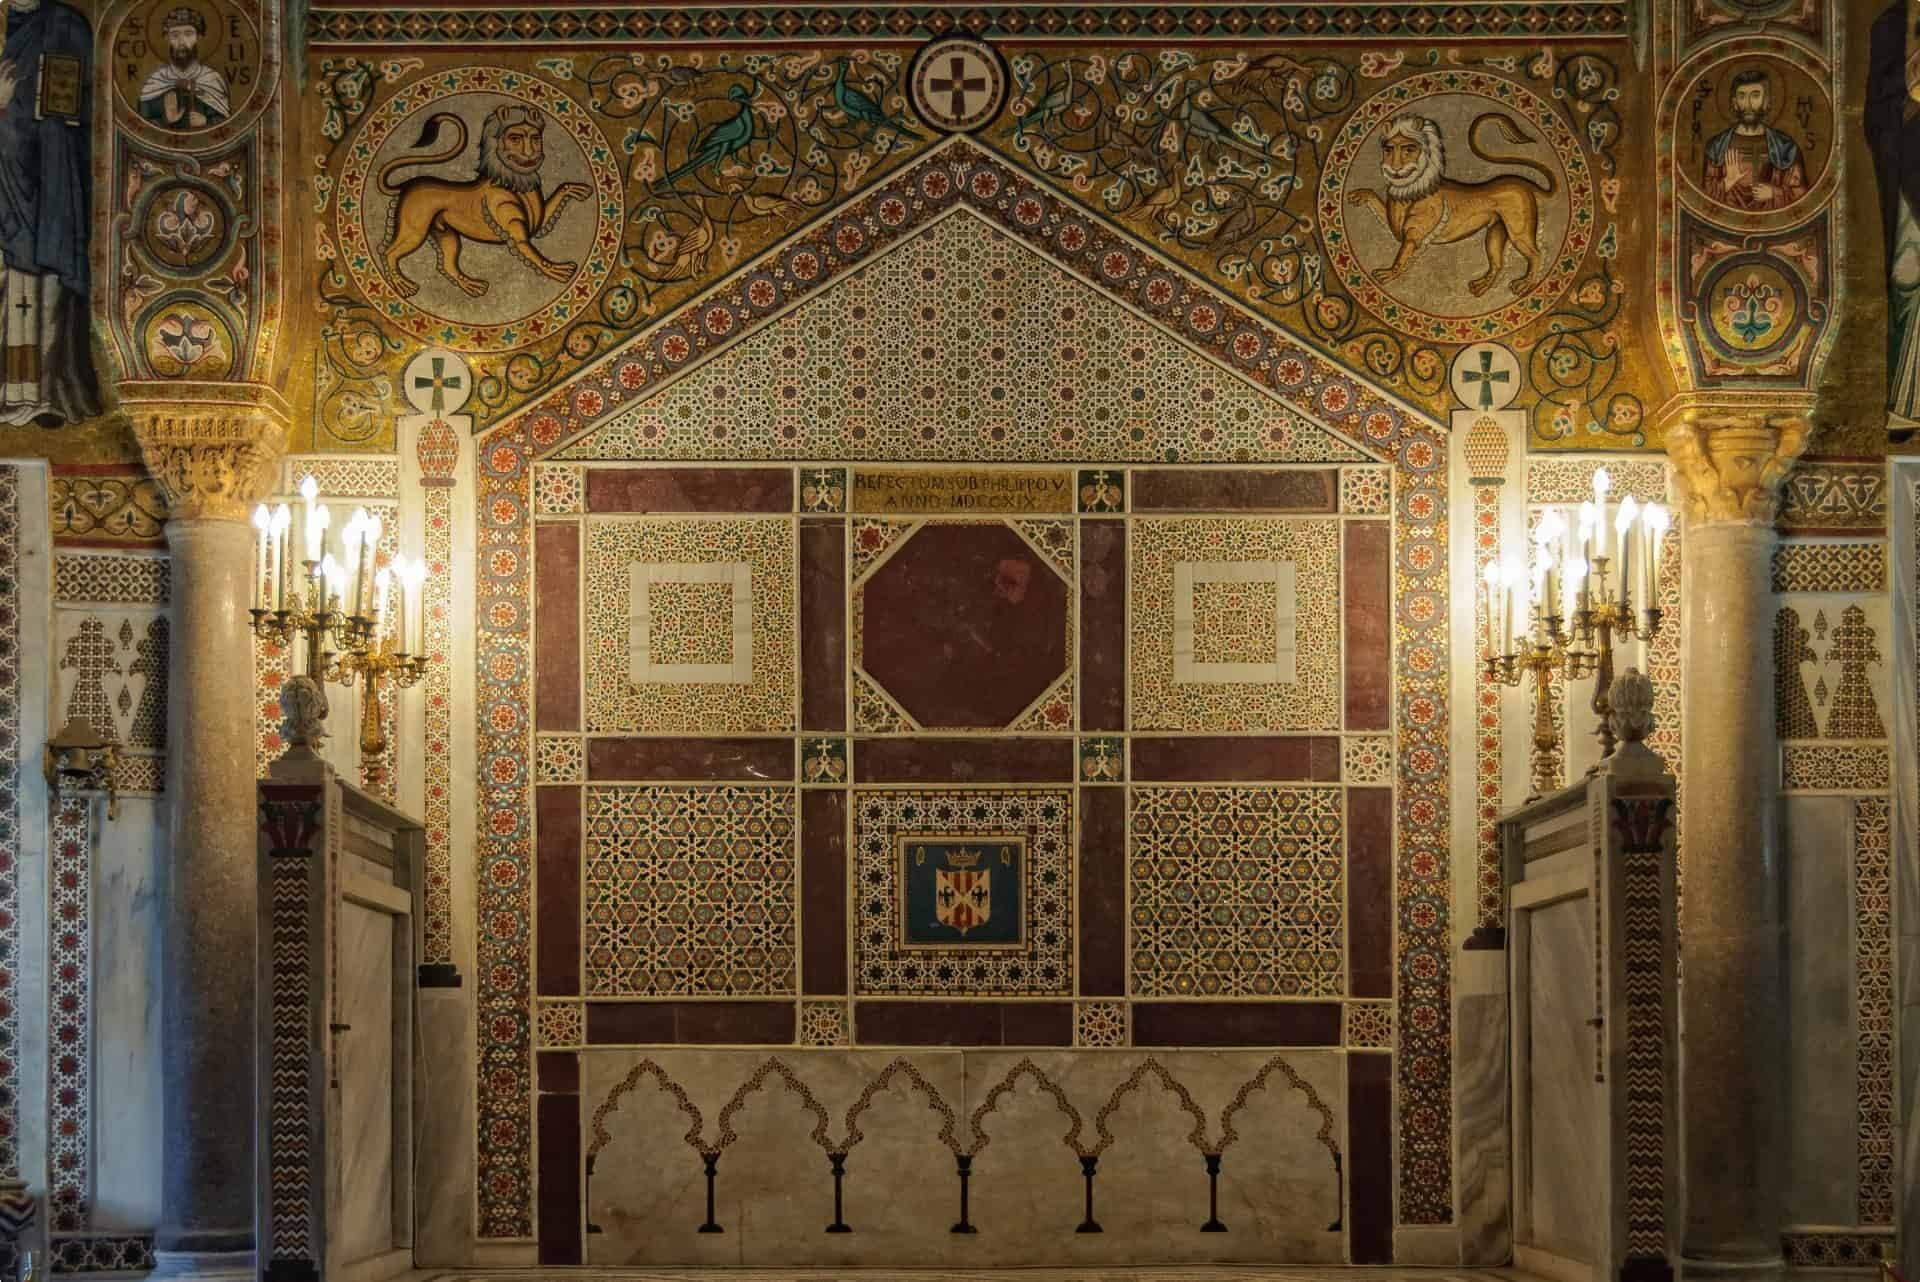 Mosaic within the Cappalla Palatina, Sicily